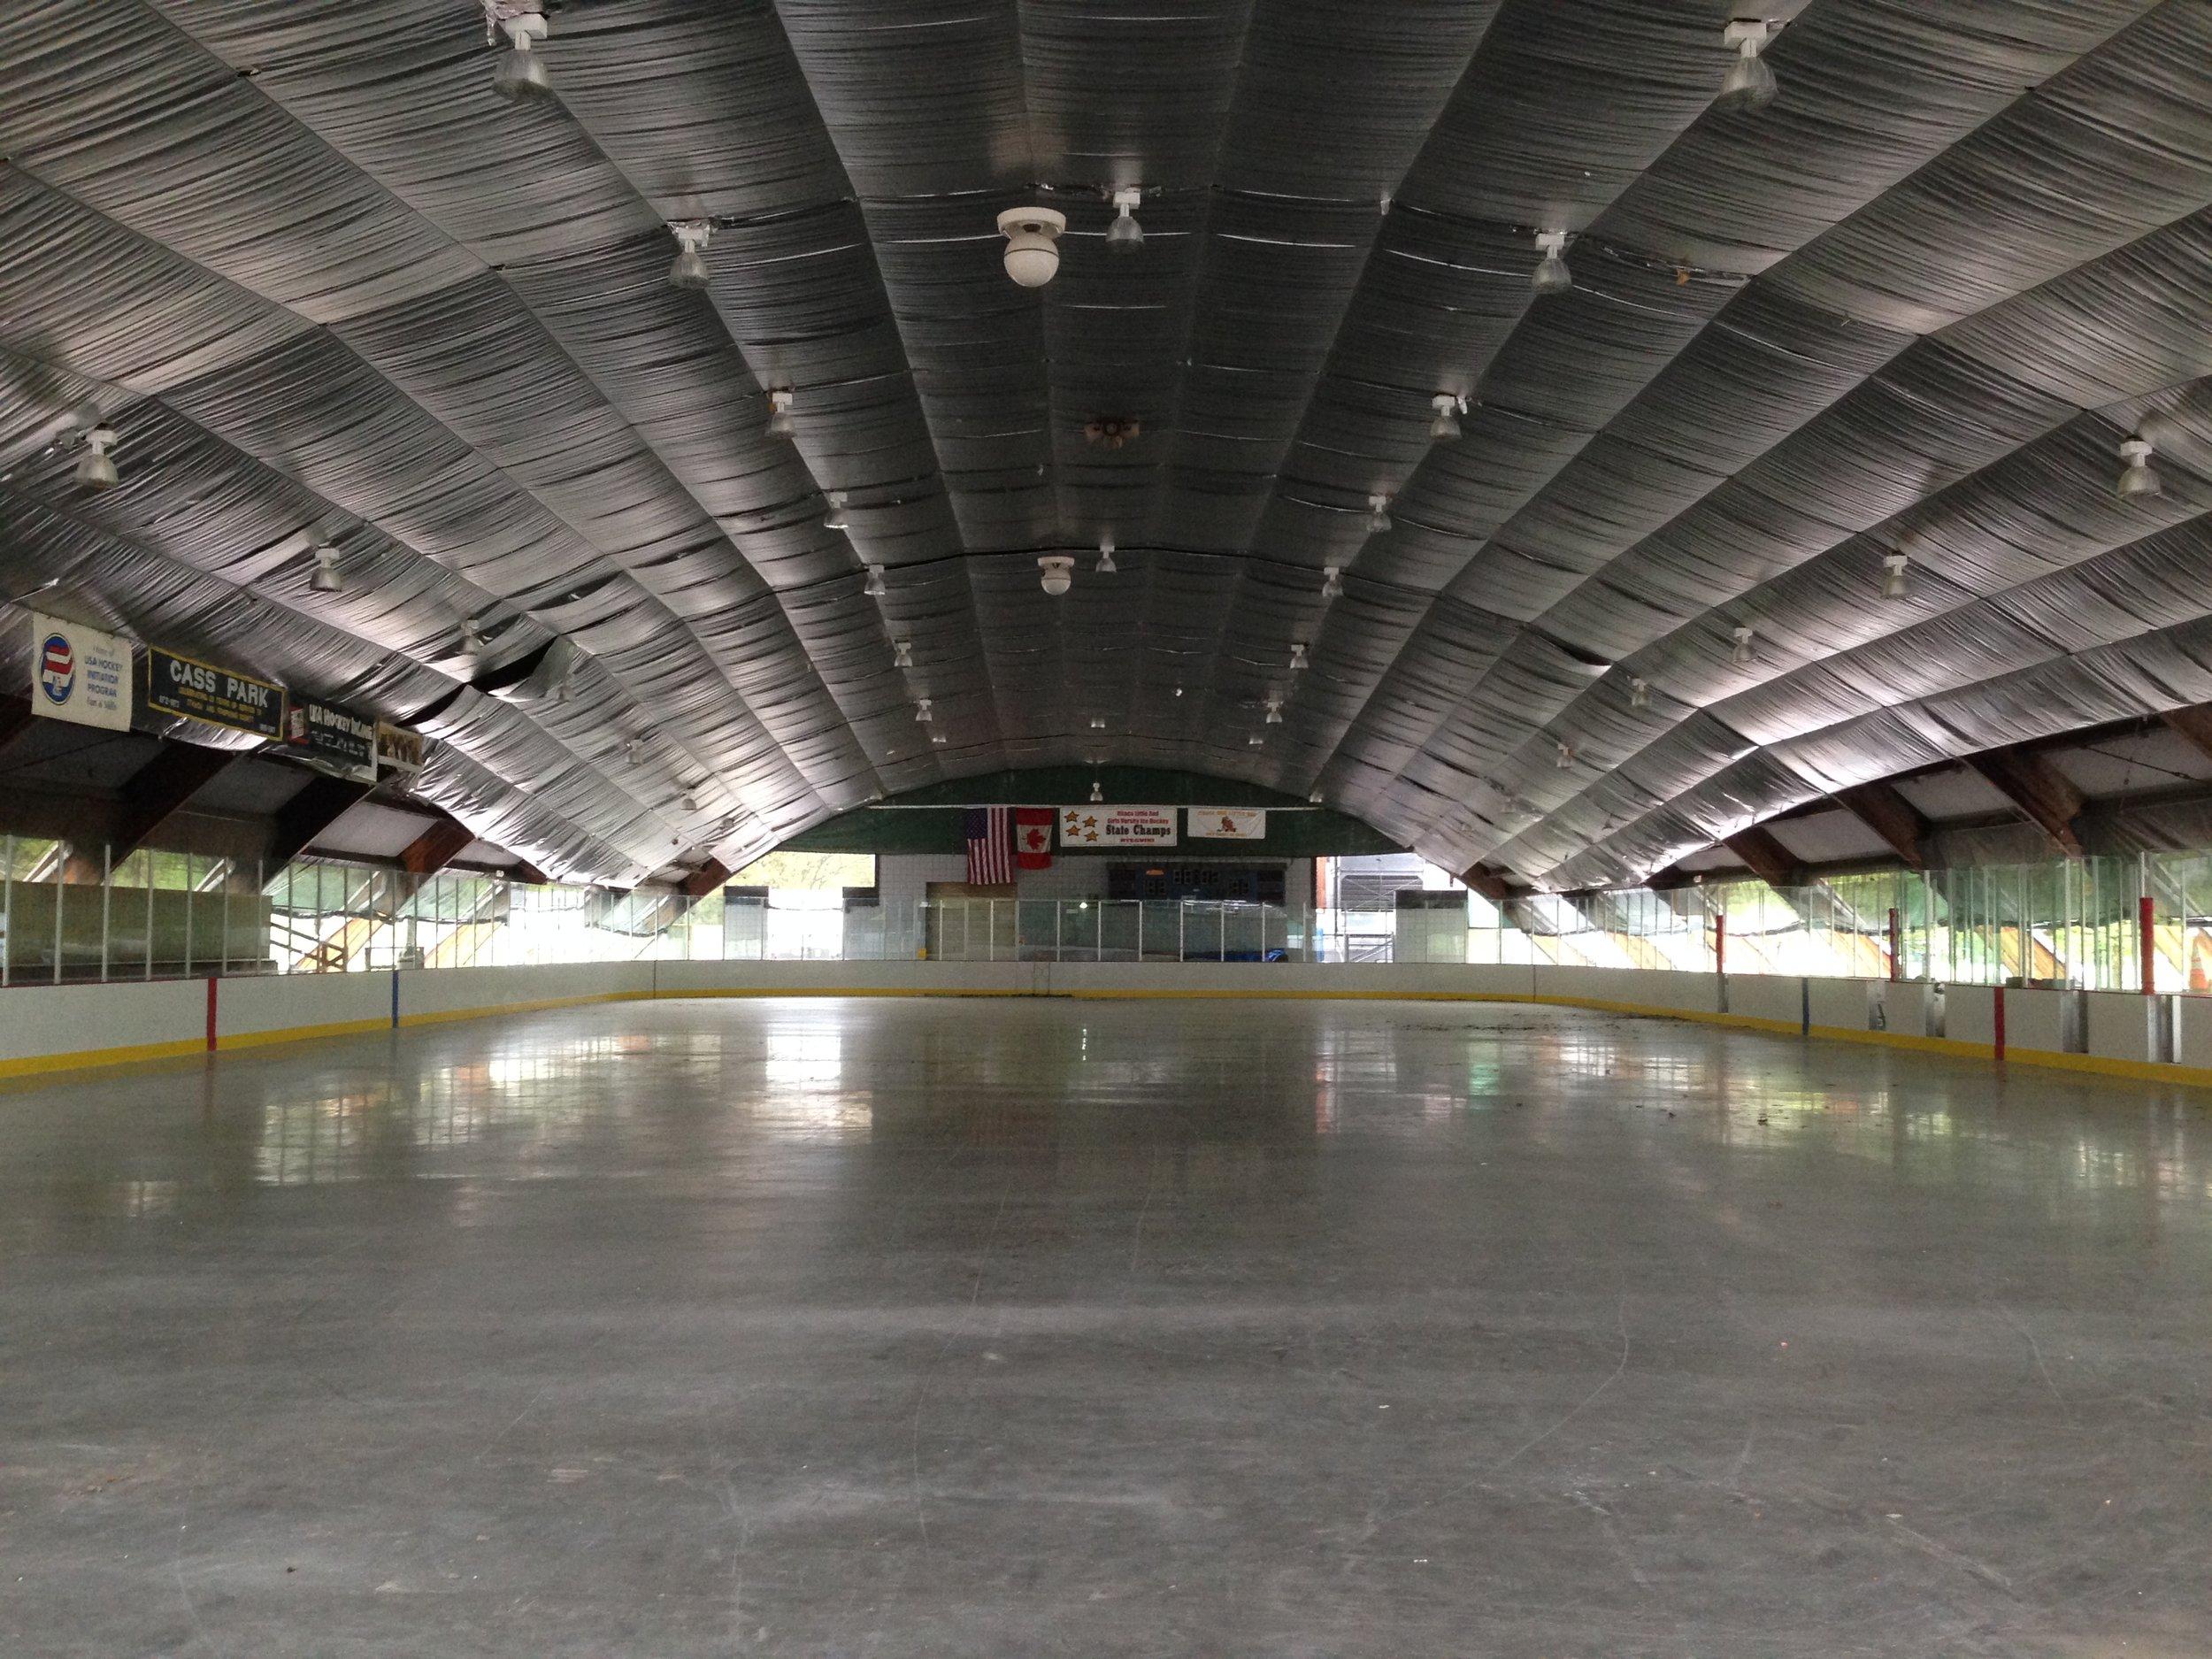 Cass Park Municipal Ice Rink--Ithaca, NY